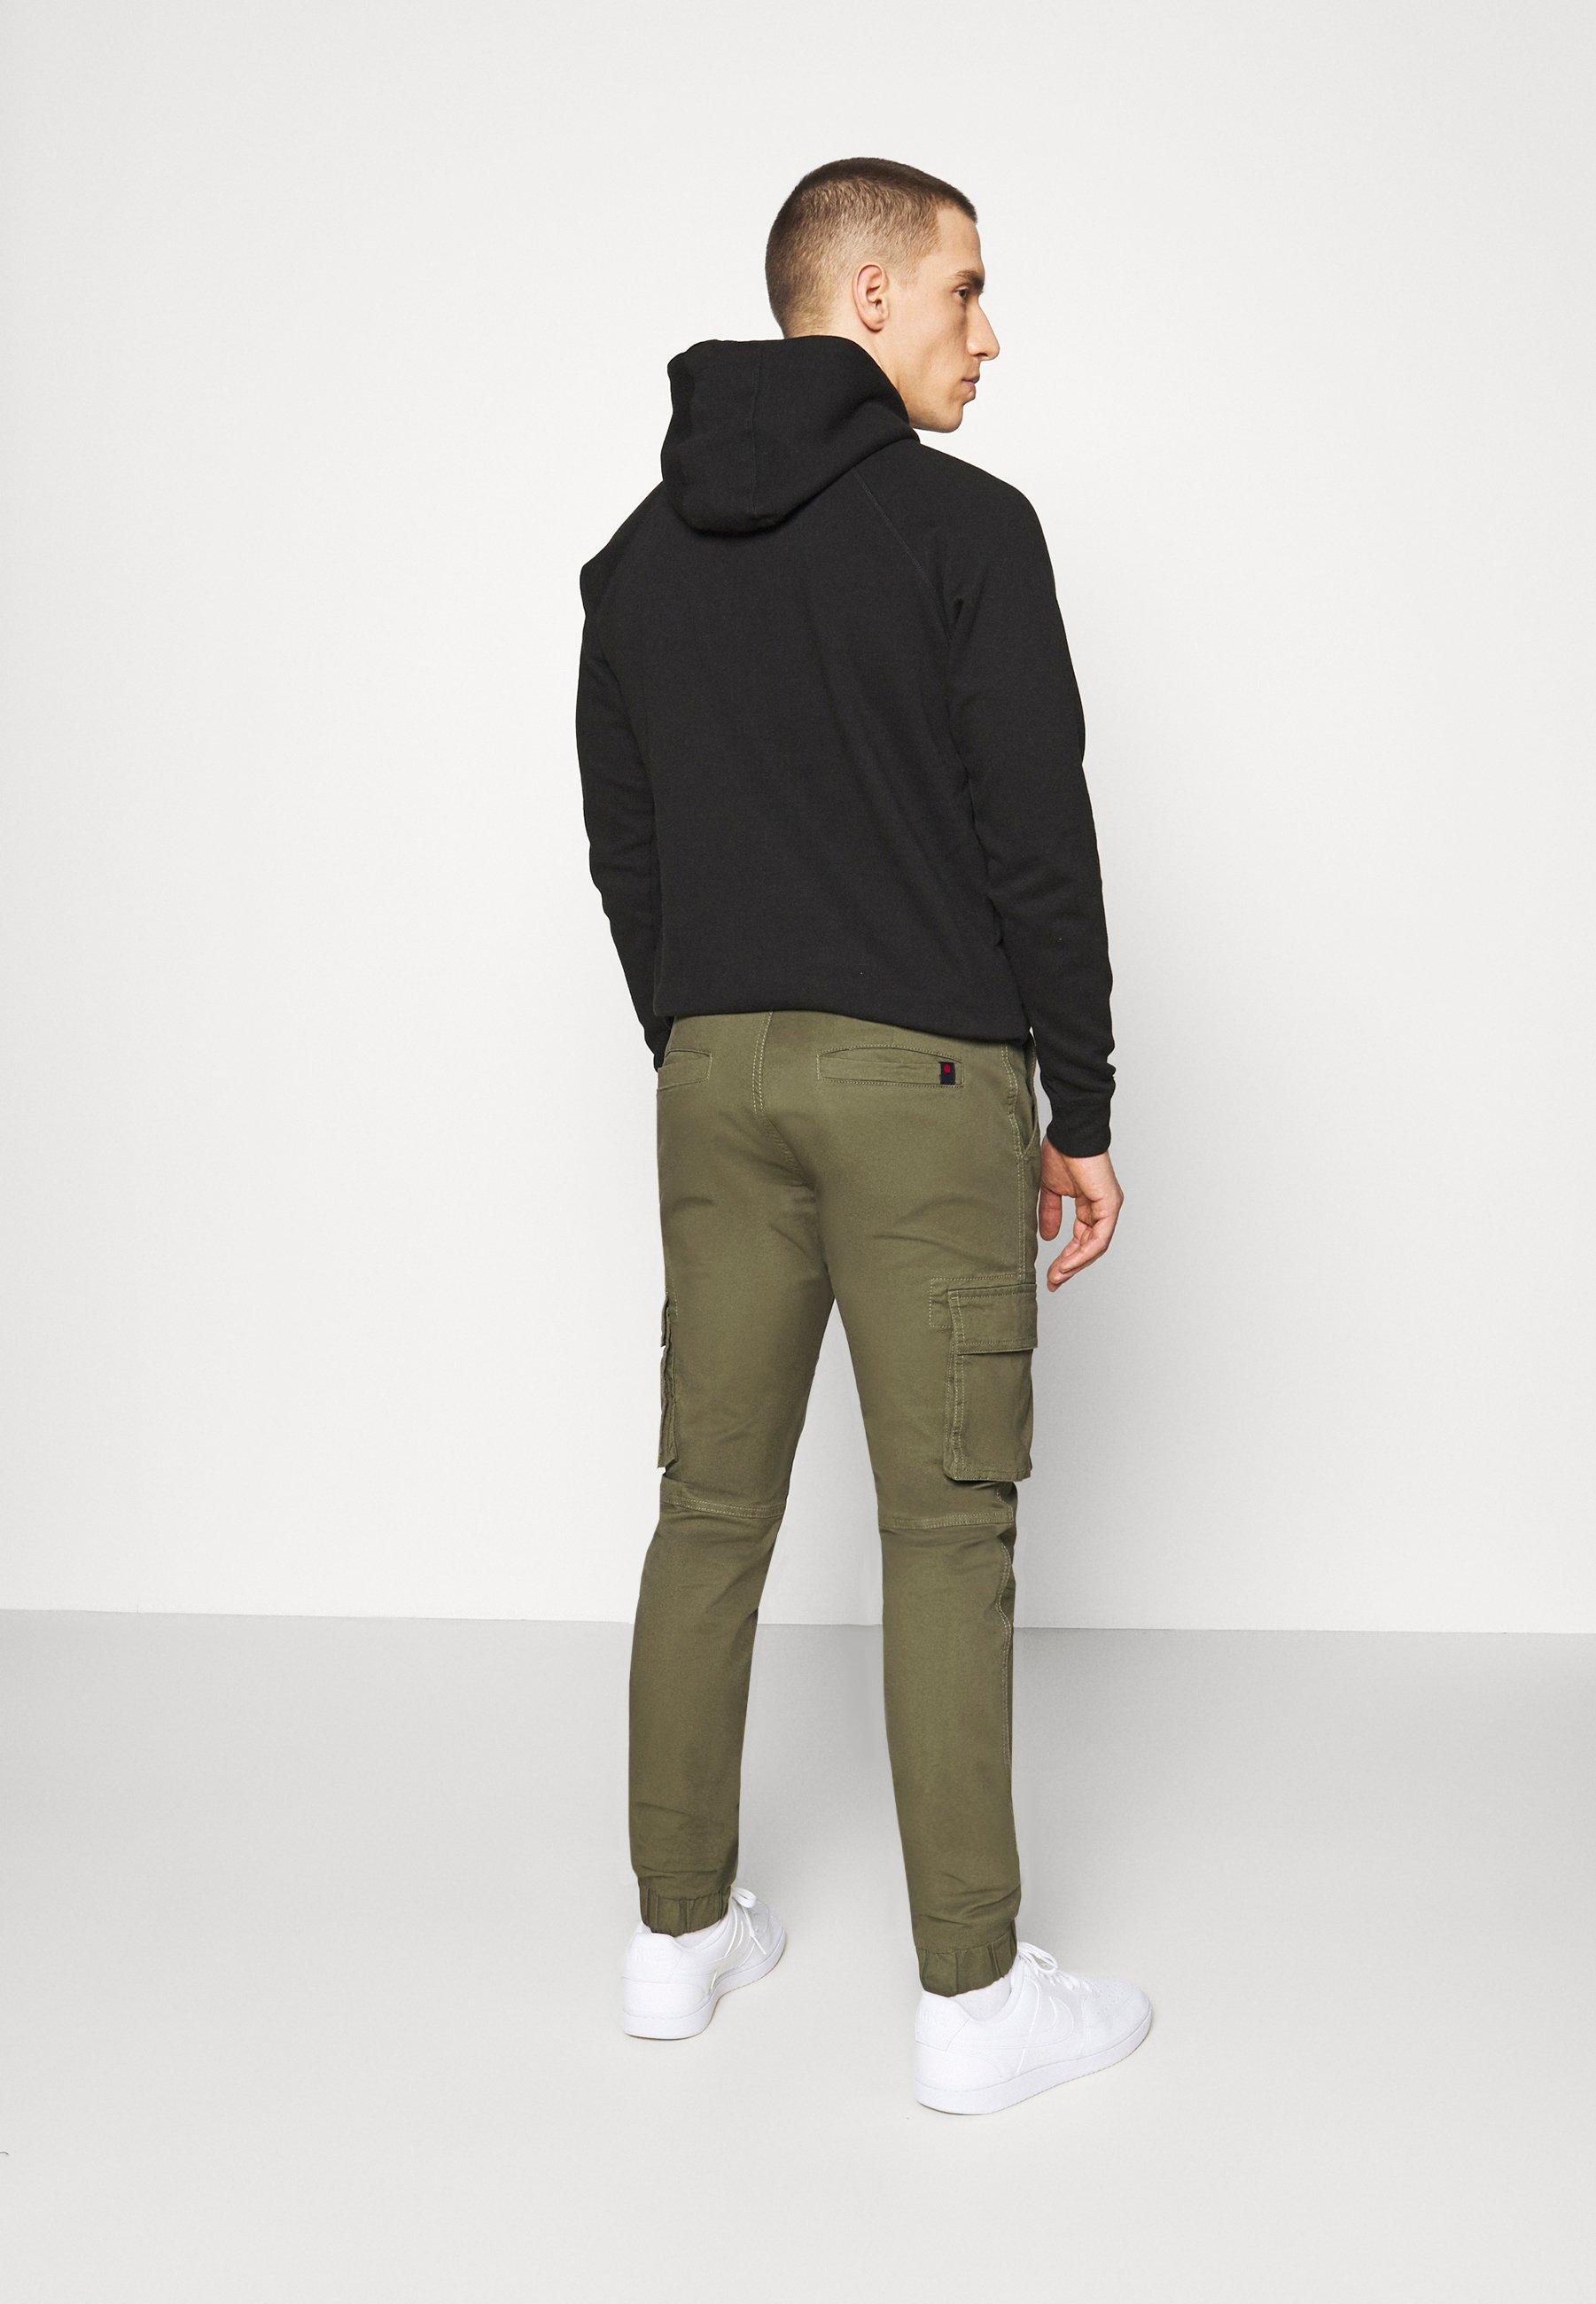 Homme PANT - Pantalon cargo